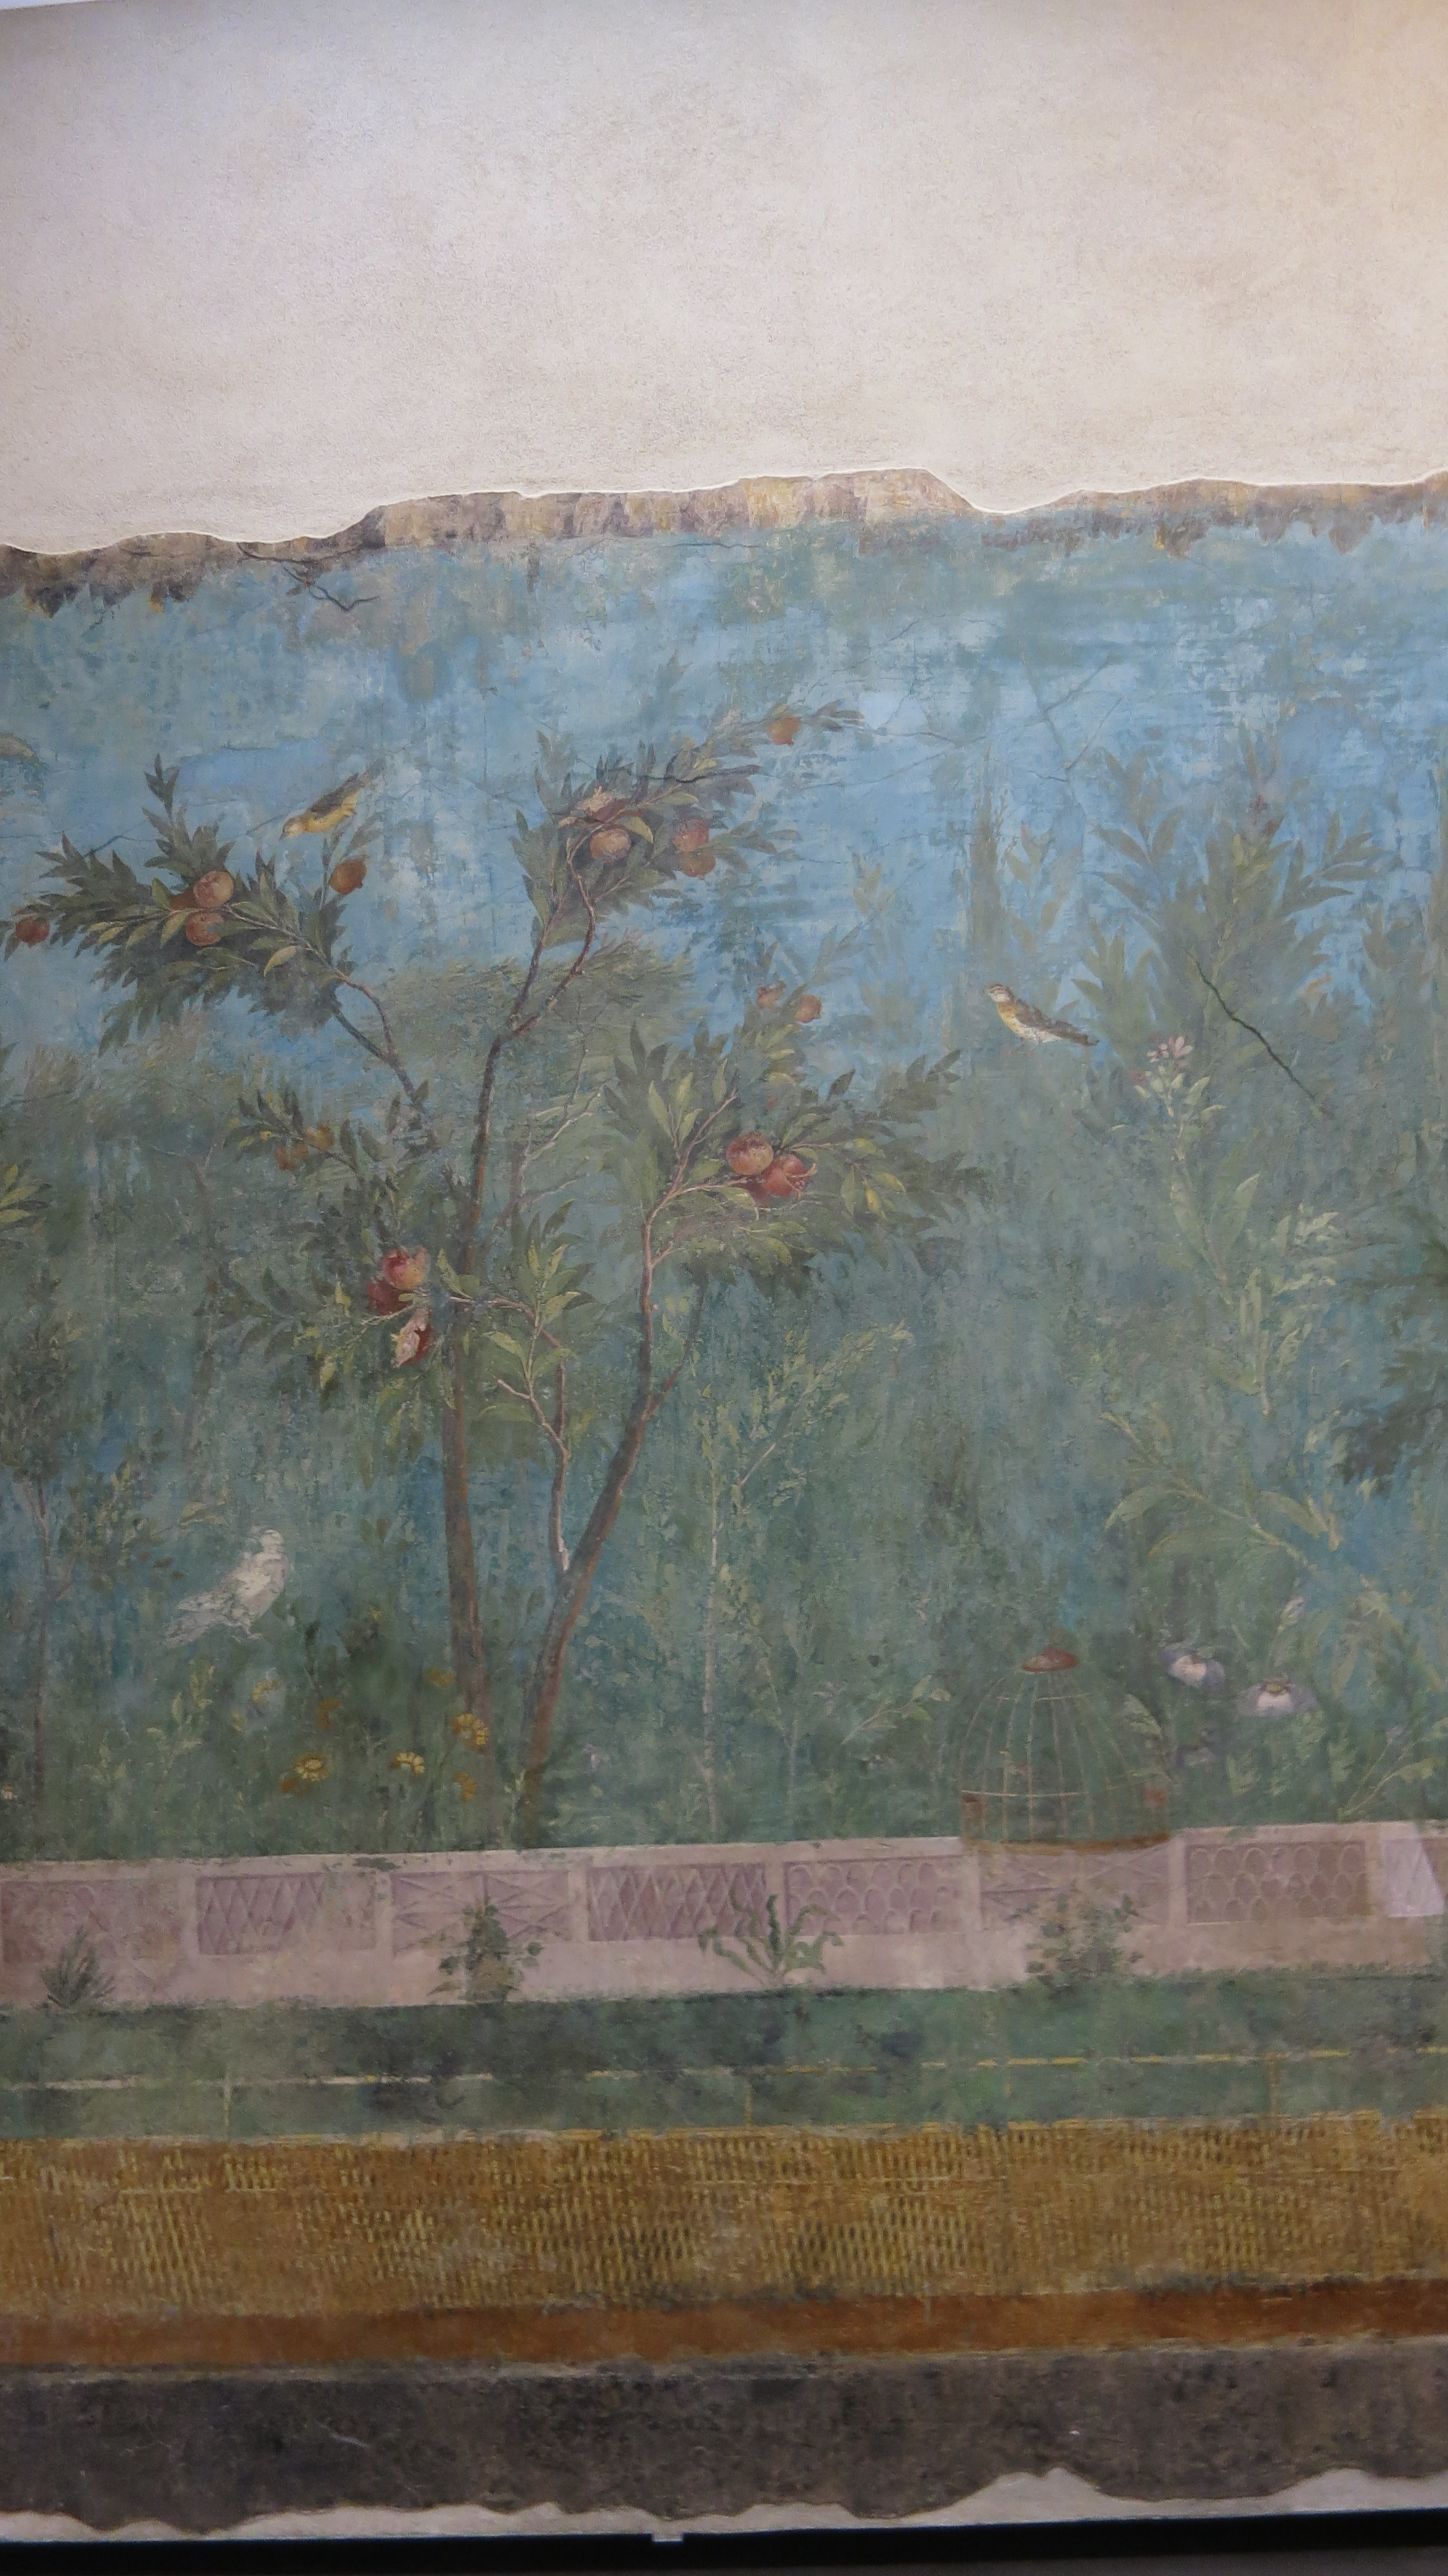 https://d33wubrfki0l68.cloudfront.net/d99957c955448ebb5947b664106a483e9546b8b9/65786/posts/06-11-19/livia-villa-fresco.jpg